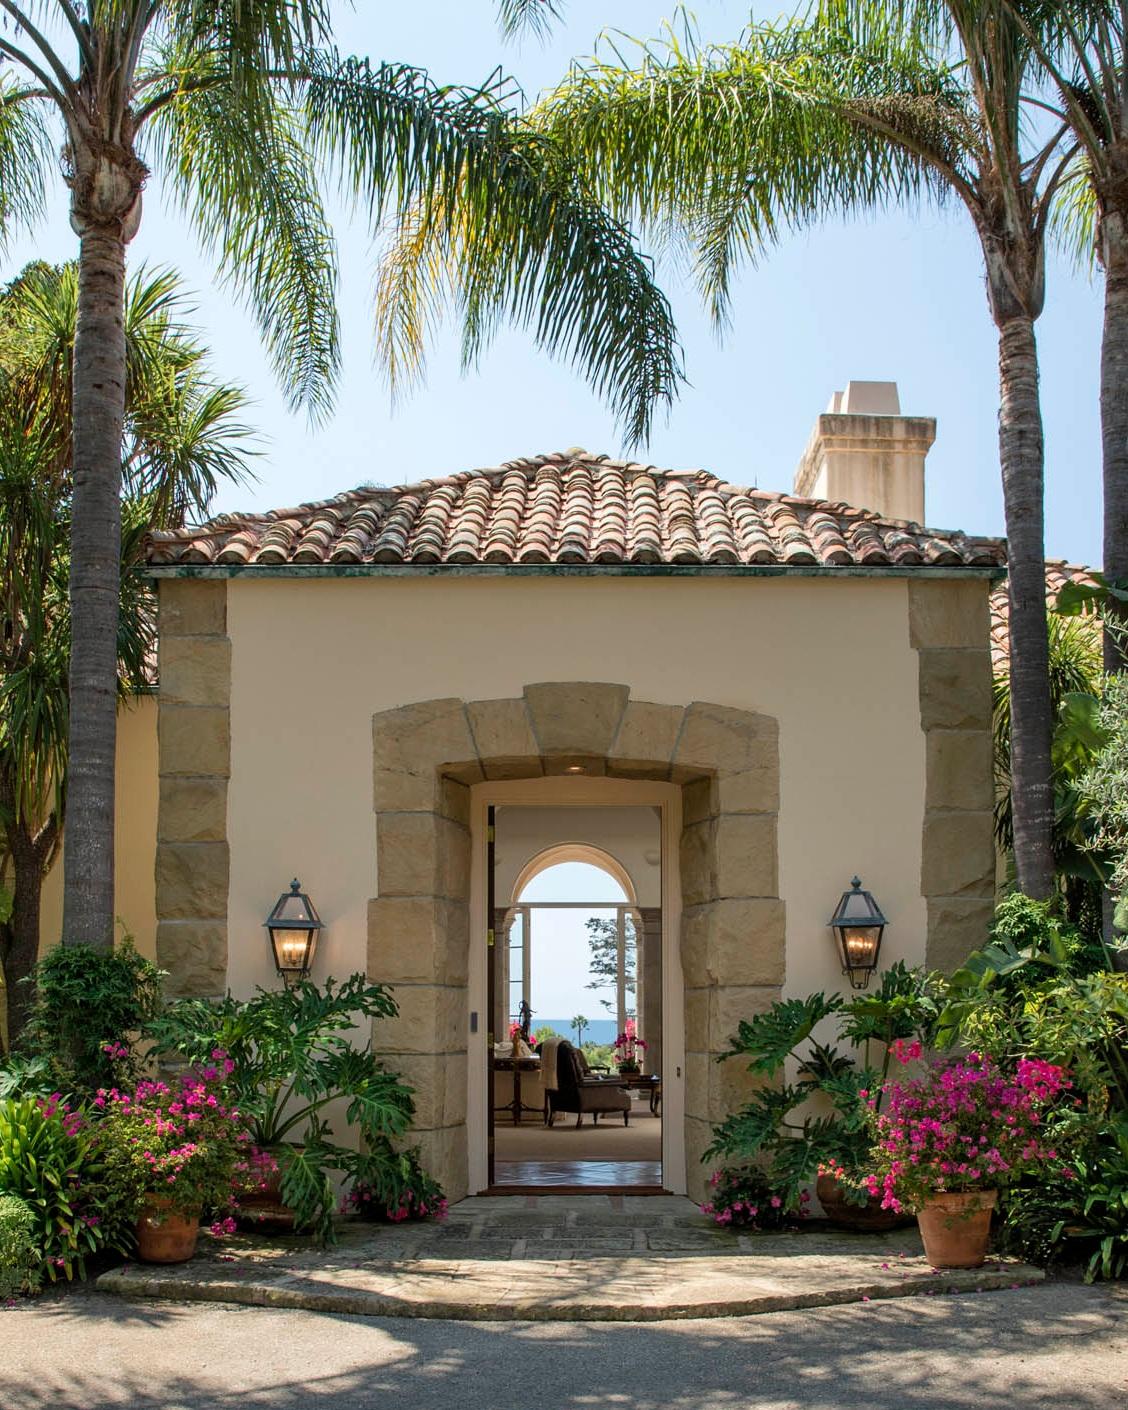 Property for Sale:691 Picacho Lane, Montecito CA 93108 List Price $16,500,000 67 Beds 6 baths 2 half baths Picacho Paradise